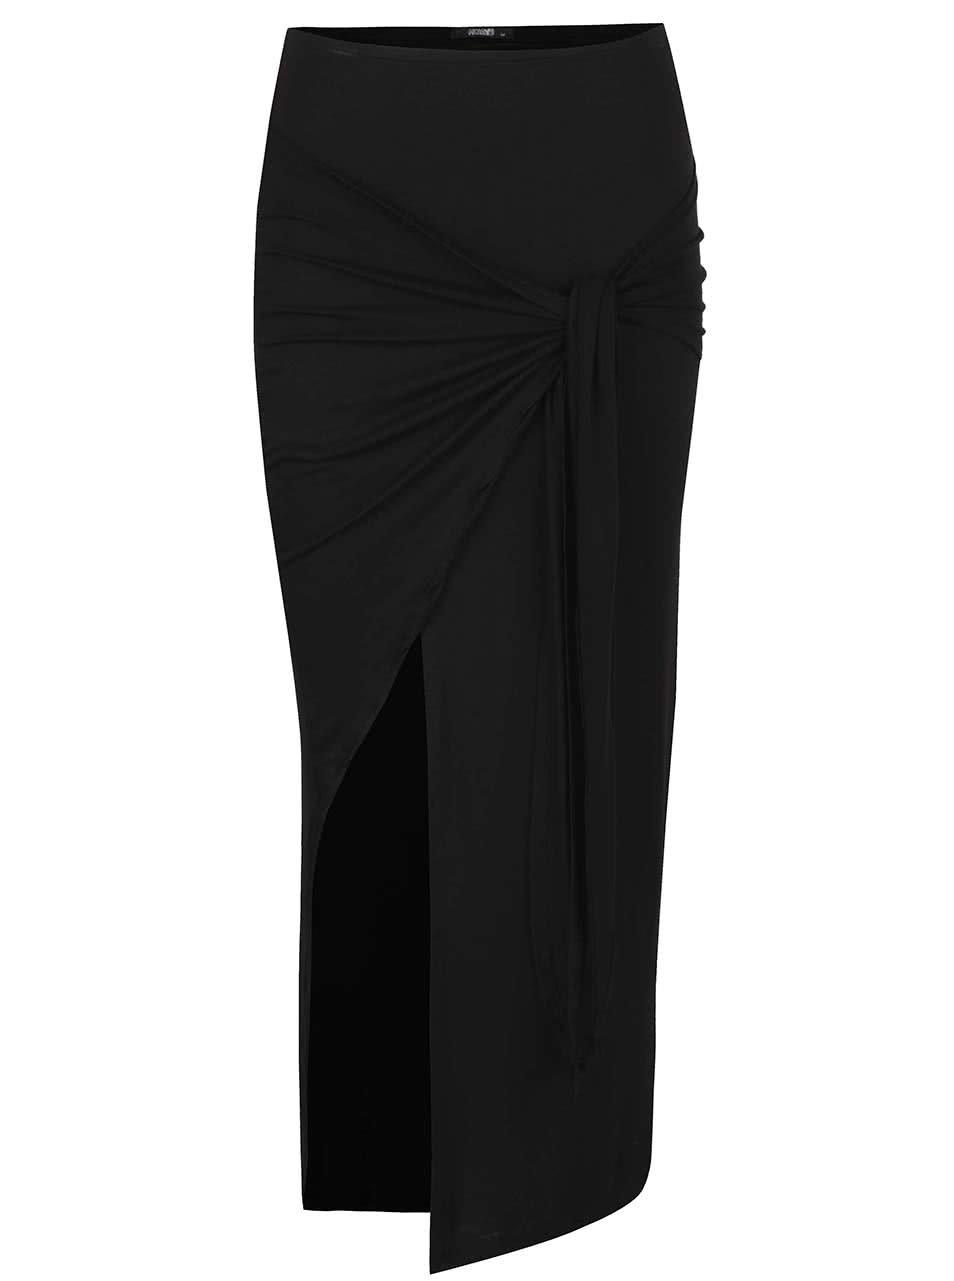 4a63b00eeba Černá maxi sukně s rozparkem Haily s Racie ...